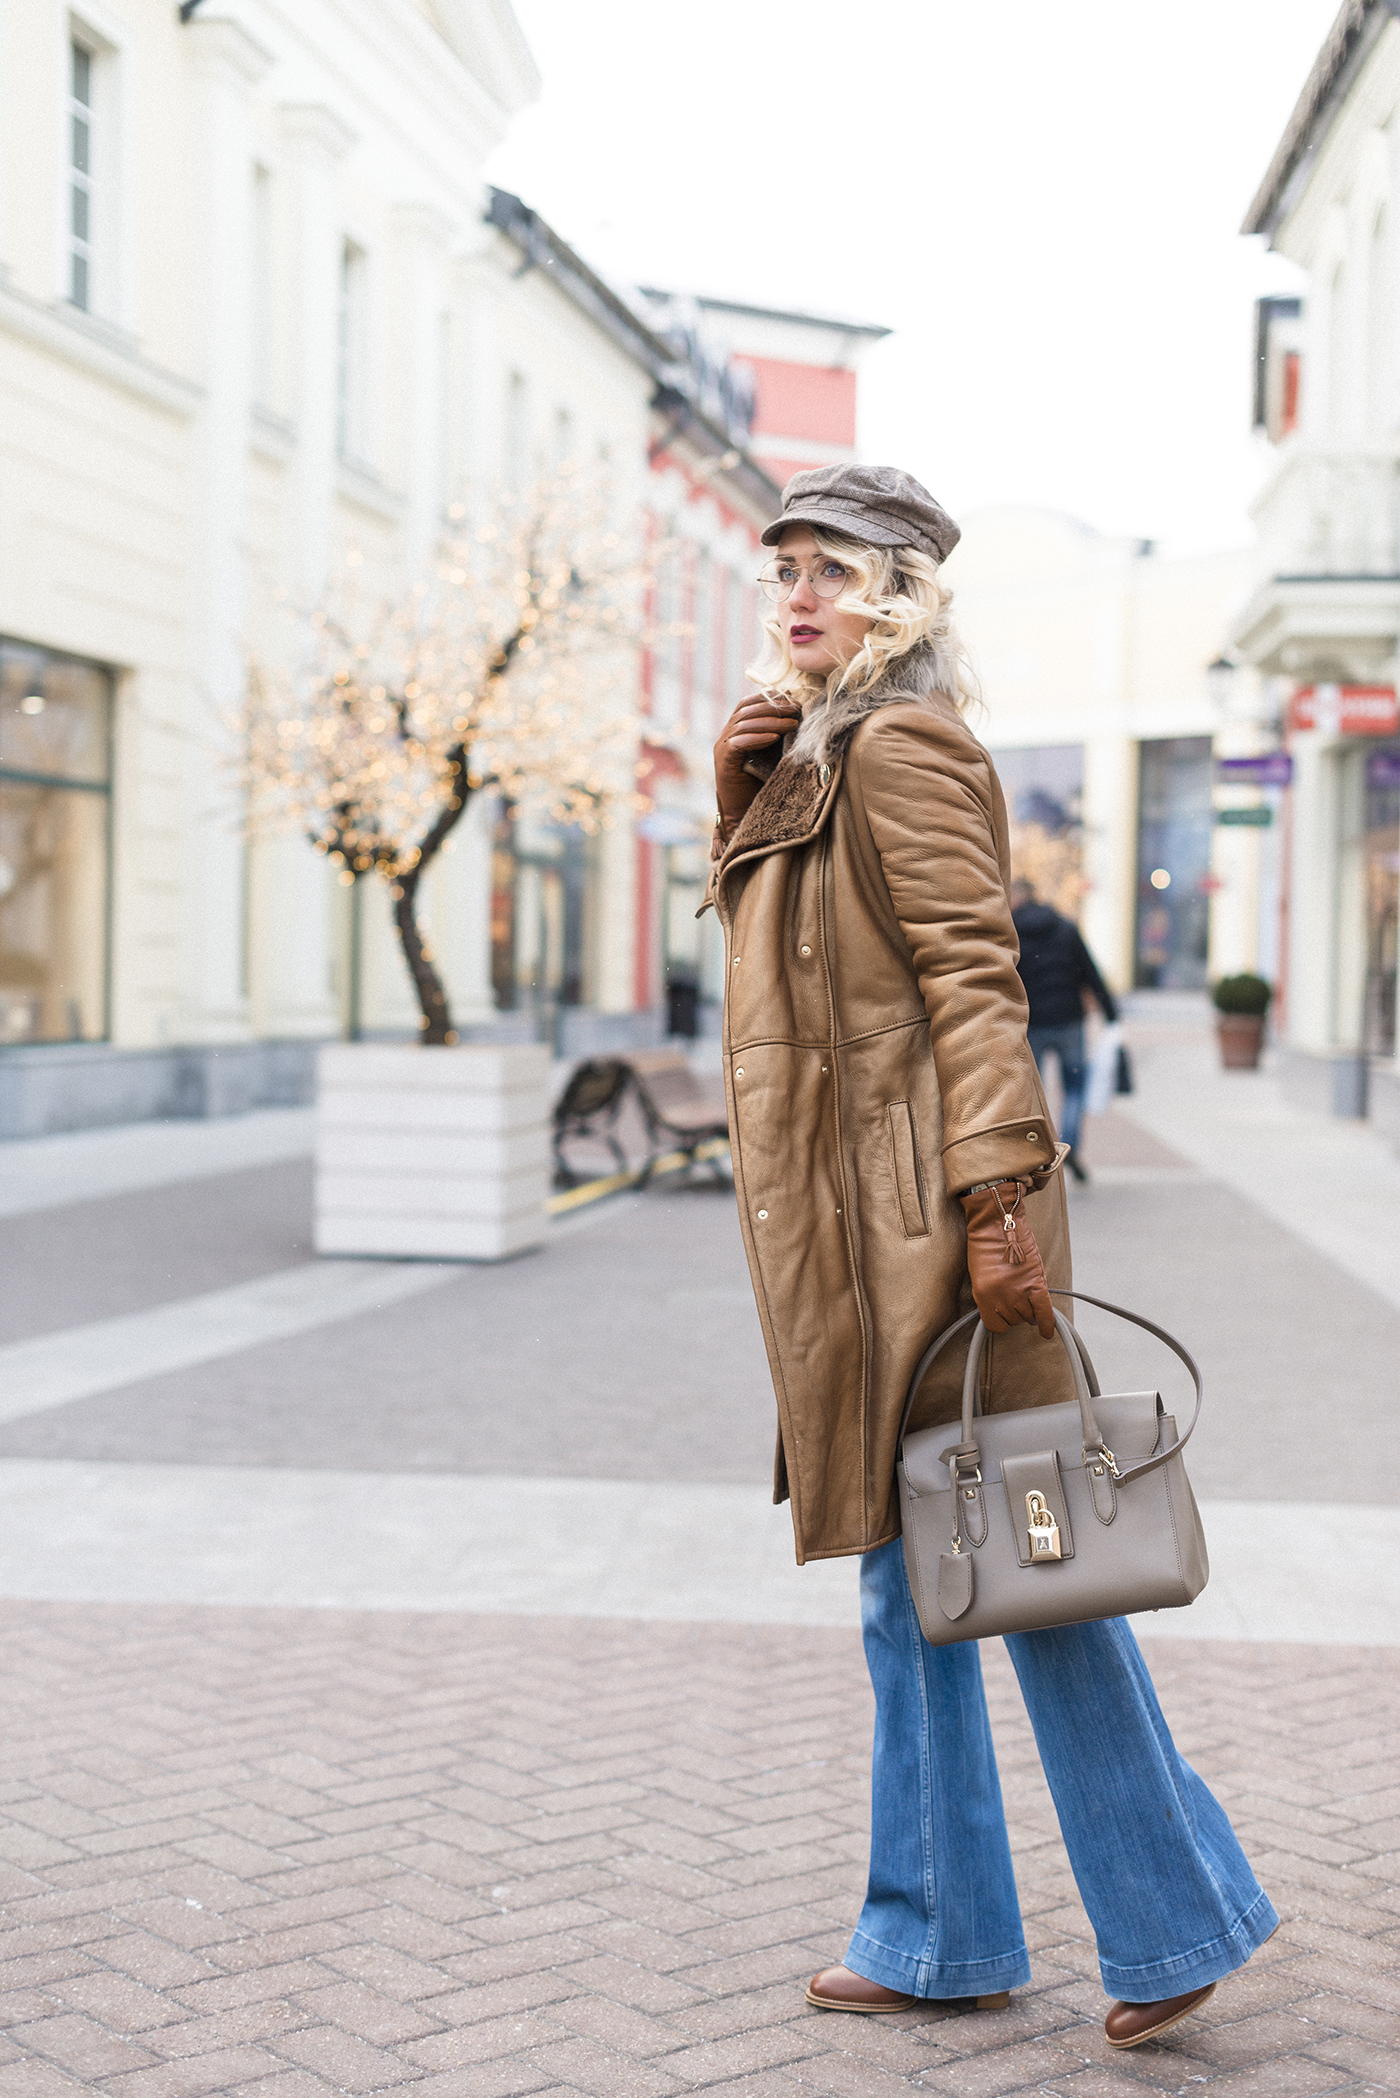 inspiration, streetstyle, winter outfit, annamidday, top fashion blogger, top russian fashion blogger, фэшн блогер, русский блогер, известный блогер, топовый блогер, russian bloger, top russian blogger, streetfashion, russian fashion blogger, blogger, fashion, style, fashionista, модный блогер, российский блогер, ТОП блогер, ootd, lookoftheday, look, популярный блогер, российский модный блогер, russian girl, с чем носить дубленку, с чем носить кепку, с чем носить джинсы клеш, расклешенные джинсы, flared jeans streetstyle, down coat streetstyle, цветовые сочетания, streetstyle, красивая девушка, золотая дубленка, Анна миддэй, анна мидэй, Patrizia Pepe FW 2016, Patrzia Pepe, fur coat streetstyle, Patrizia Pepe bag, девушка в очках, стиль 70-х, Versace collection, Versace fur coat, Versace coat, Calvin Klein flared jeans, see by chloe, see by chloe boots, оправа crizal, линзы crizal